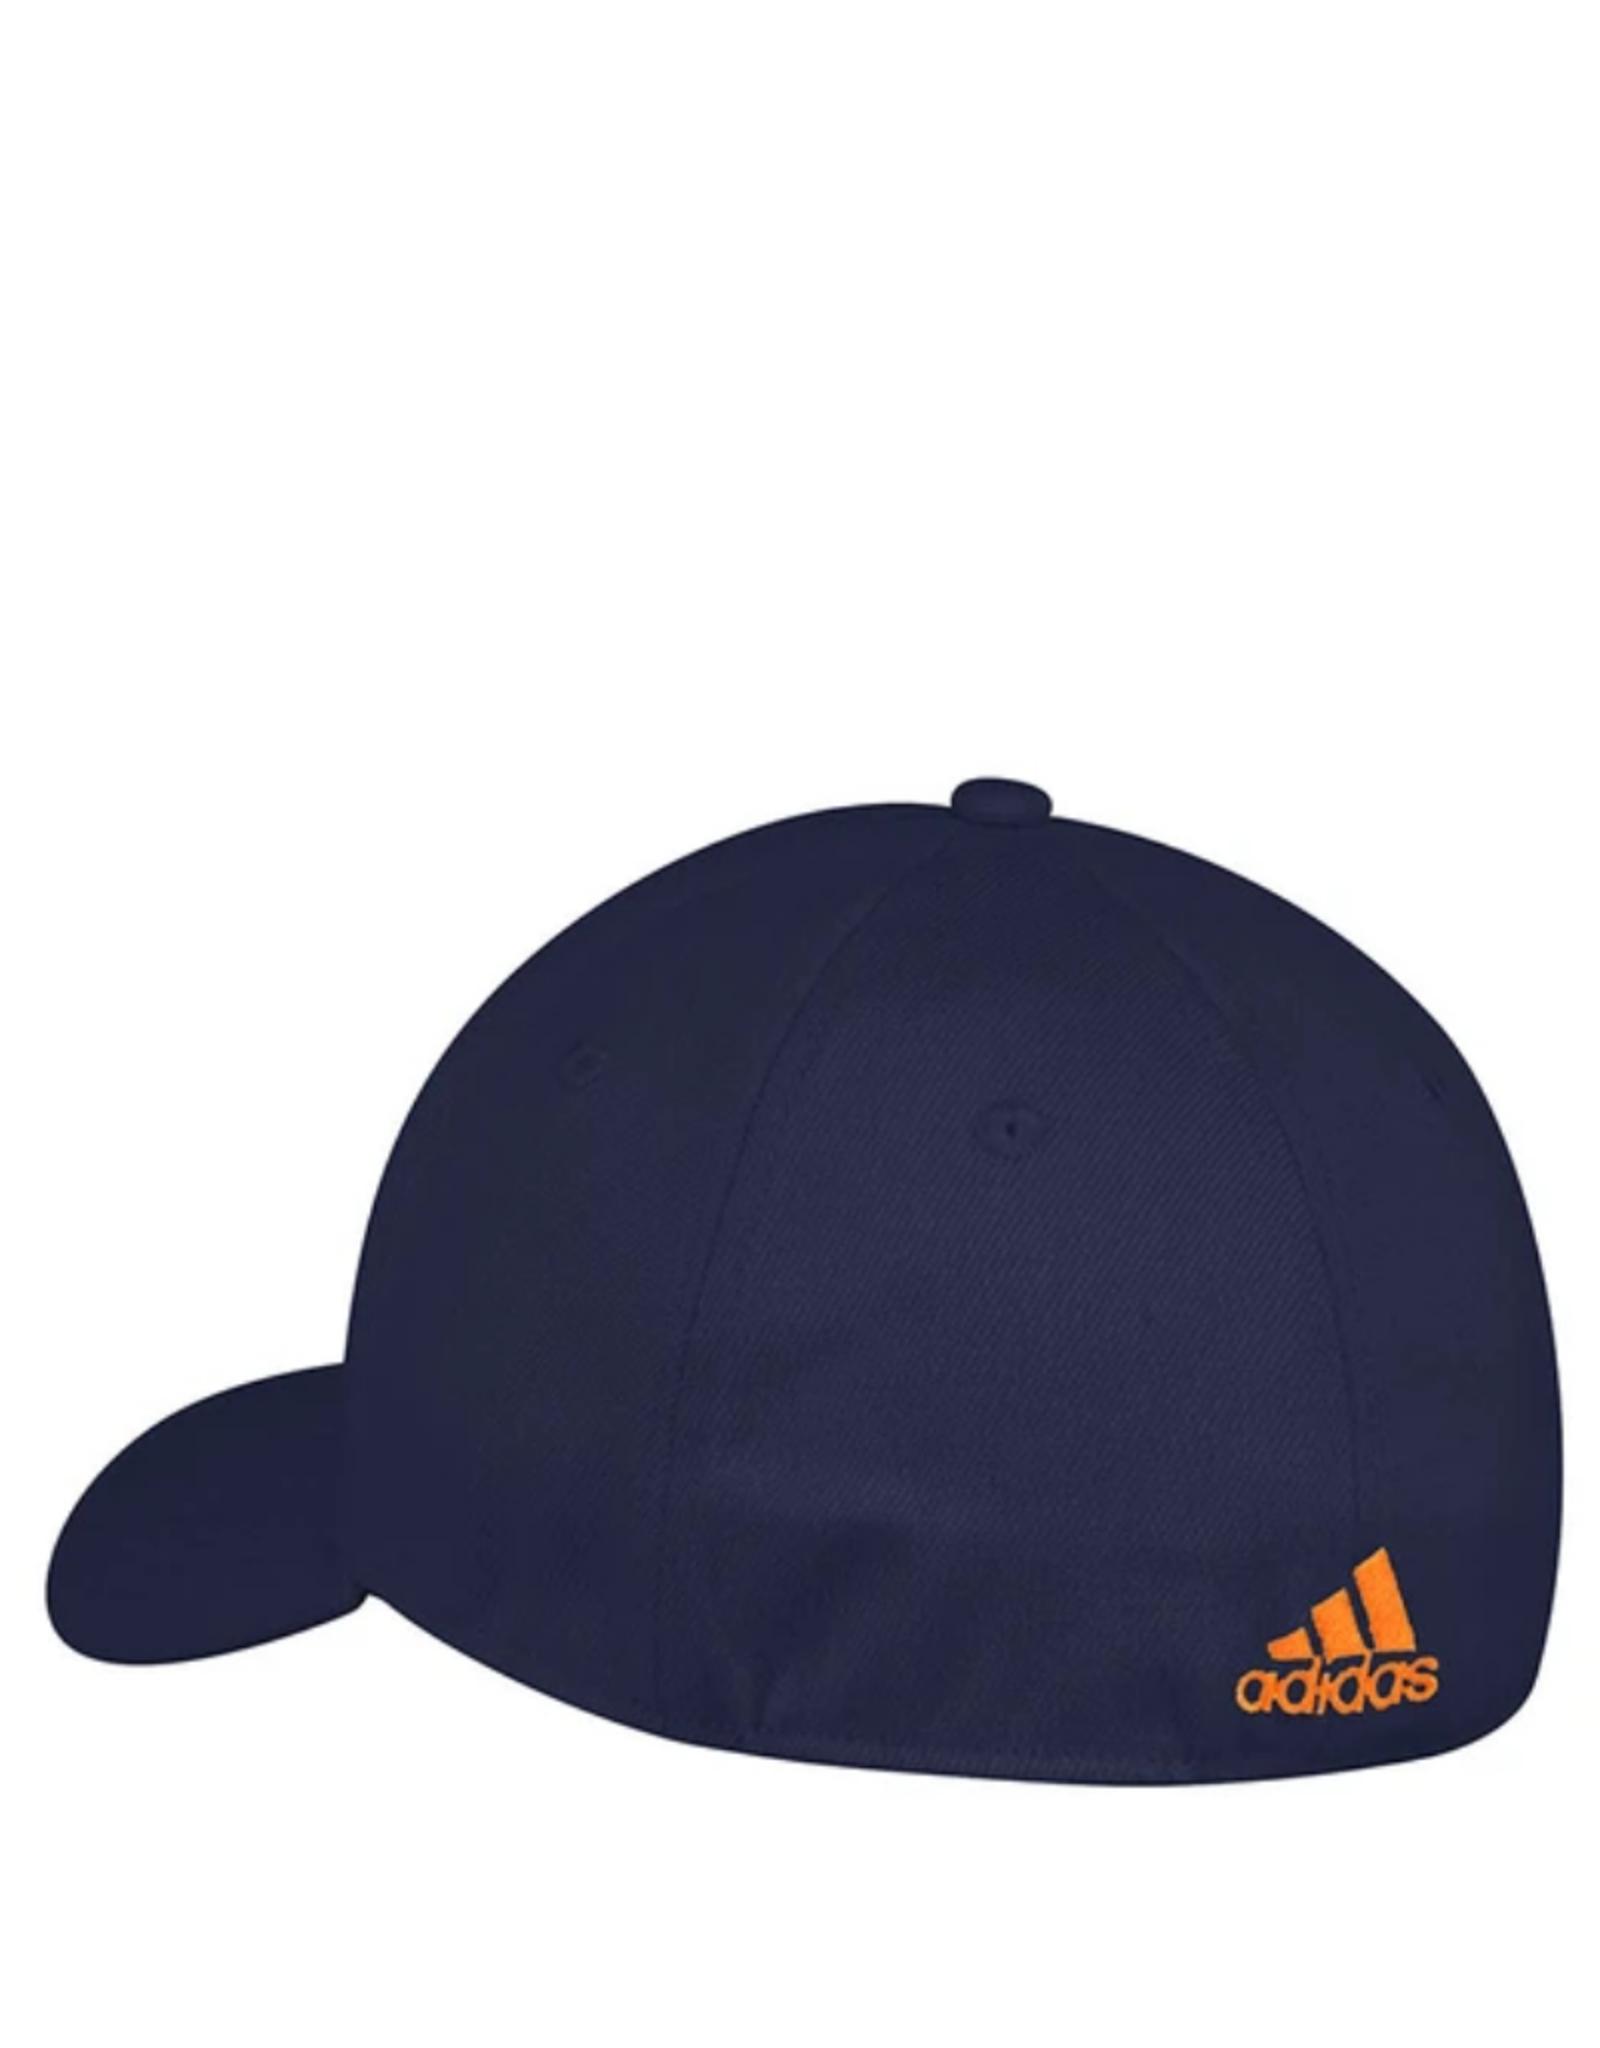 Adidas Adidas Men's Structured Flex Hat Edmonton Oilers One Size